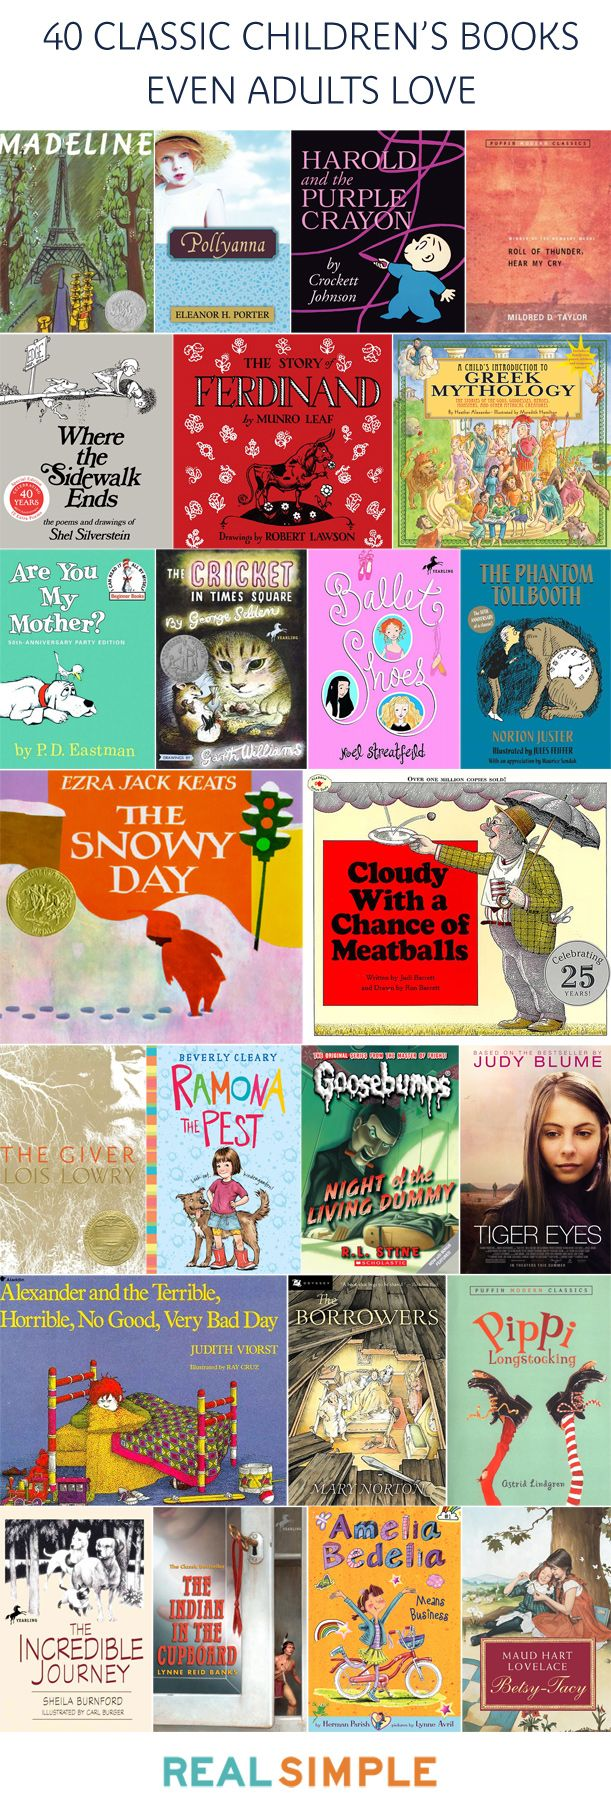 40 classic children's books even adults love.